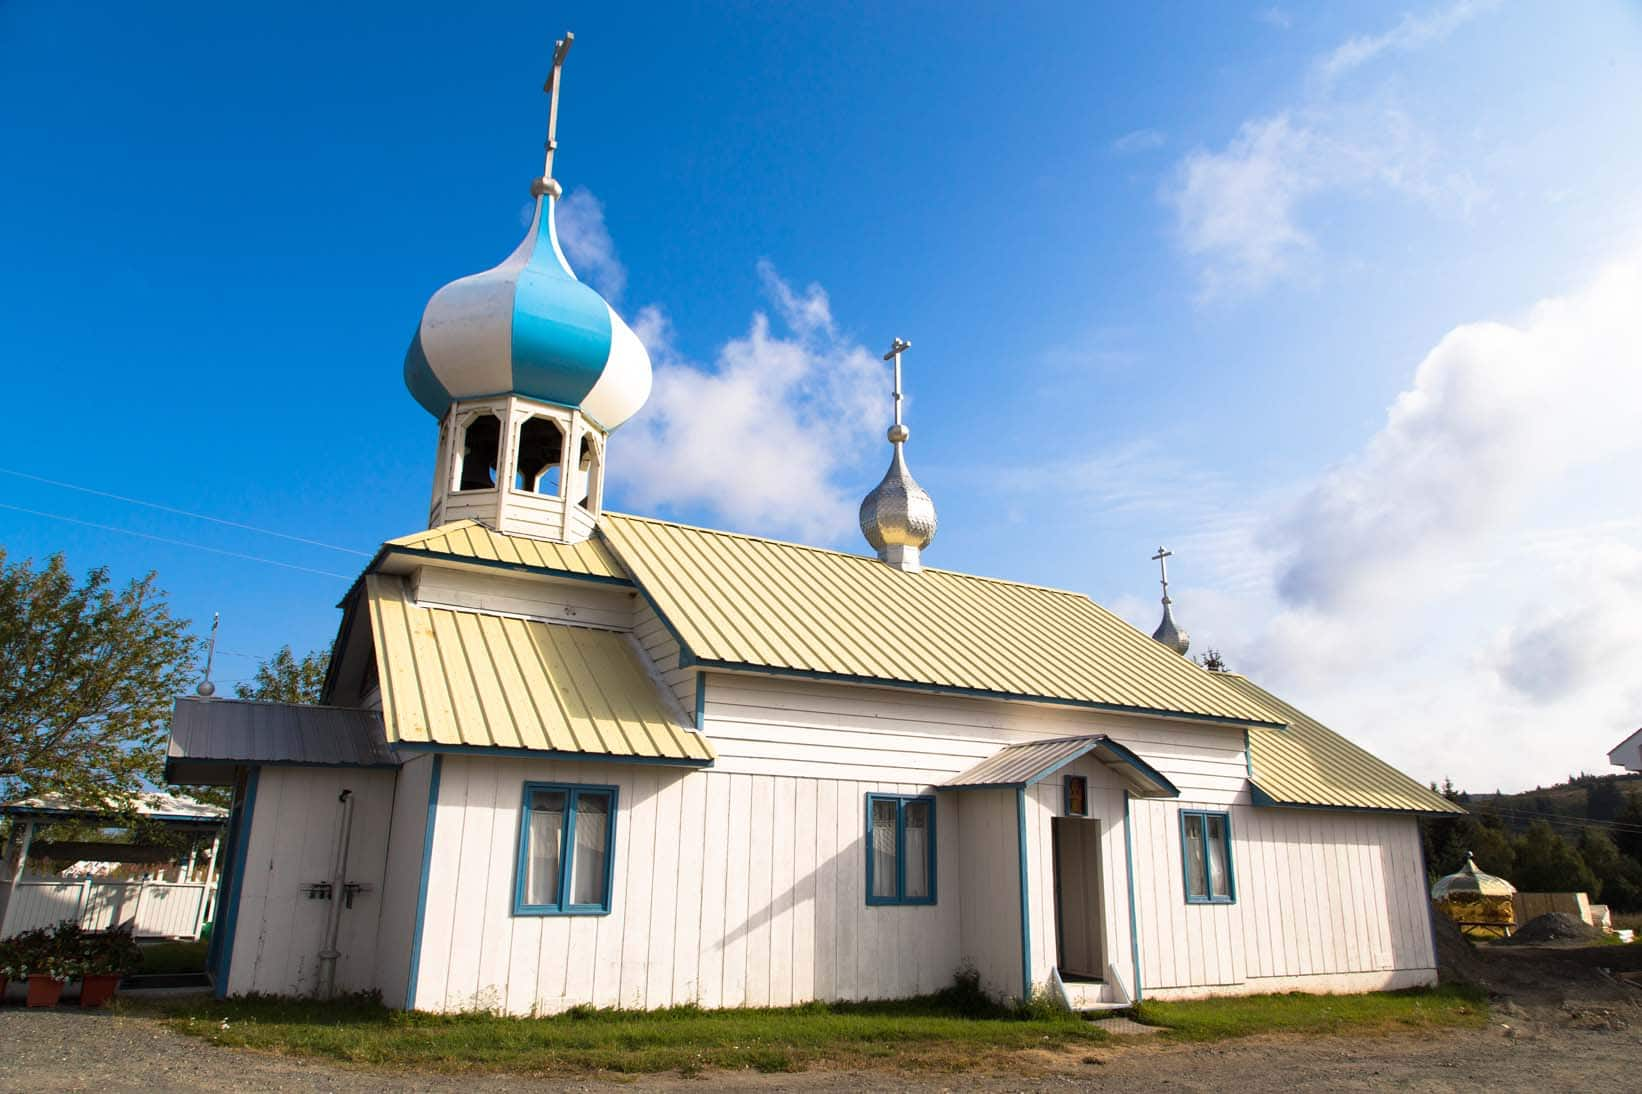 Alaska Day 20: Homer to Soldotna